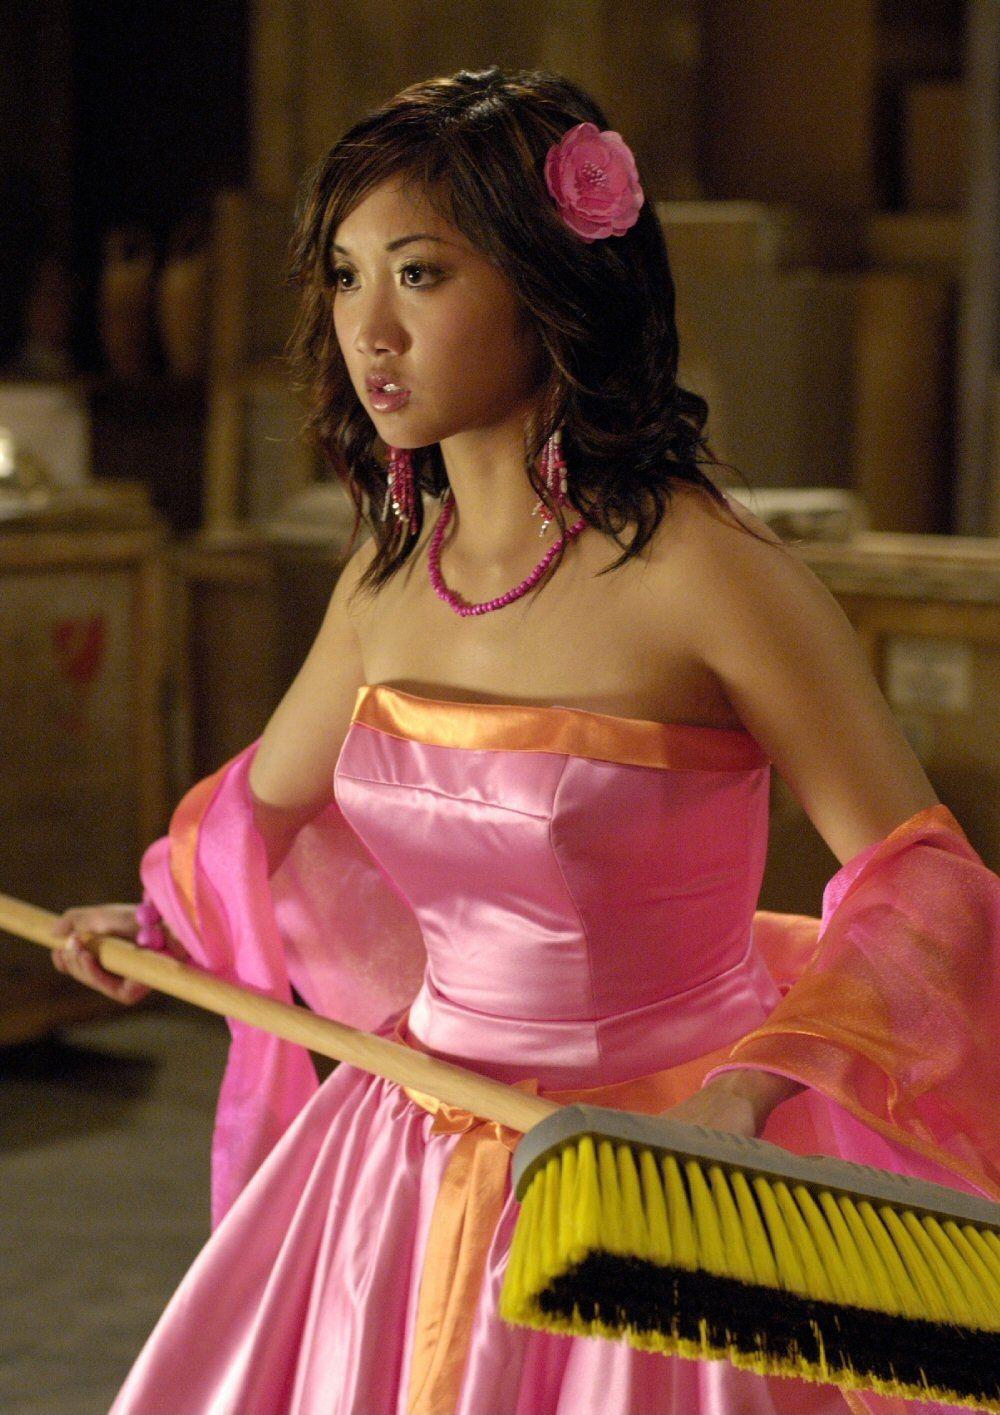 wendy wu homecoming warrior full movie online free